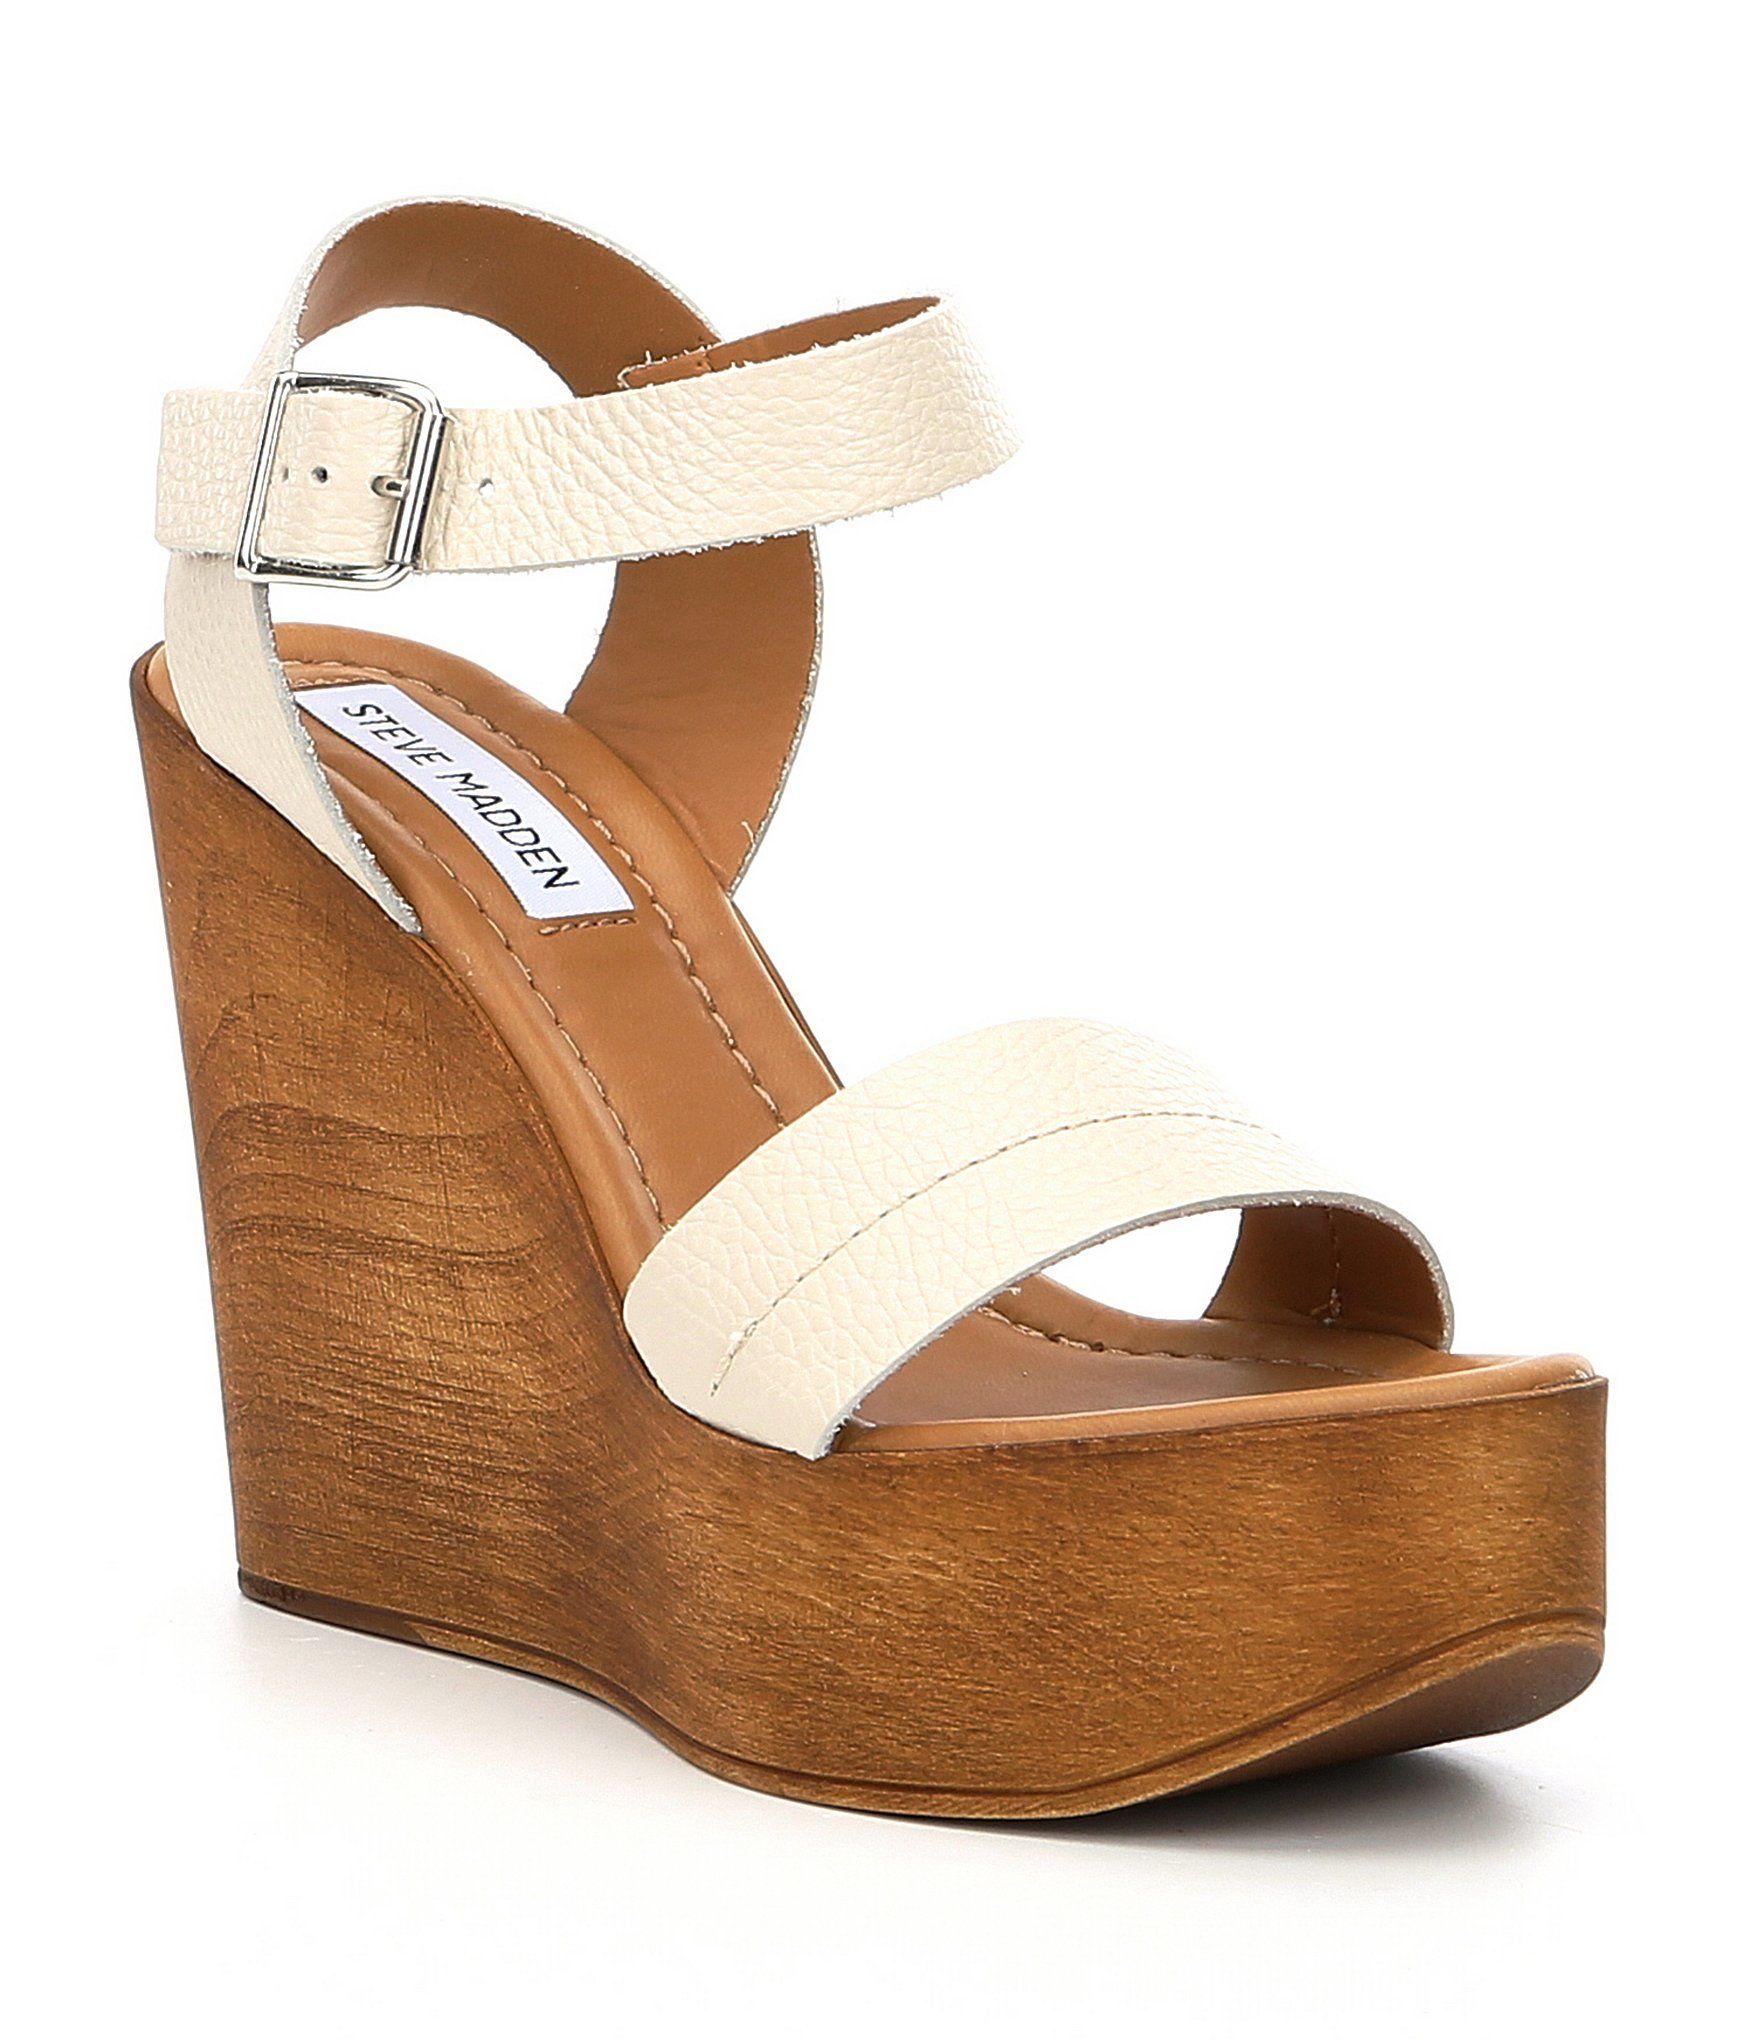 d459d7cb3cd Shop for Steve Madden Belma Leather Wedge Sandals at Dillards.com. Visit  Dillards.com to find clothing